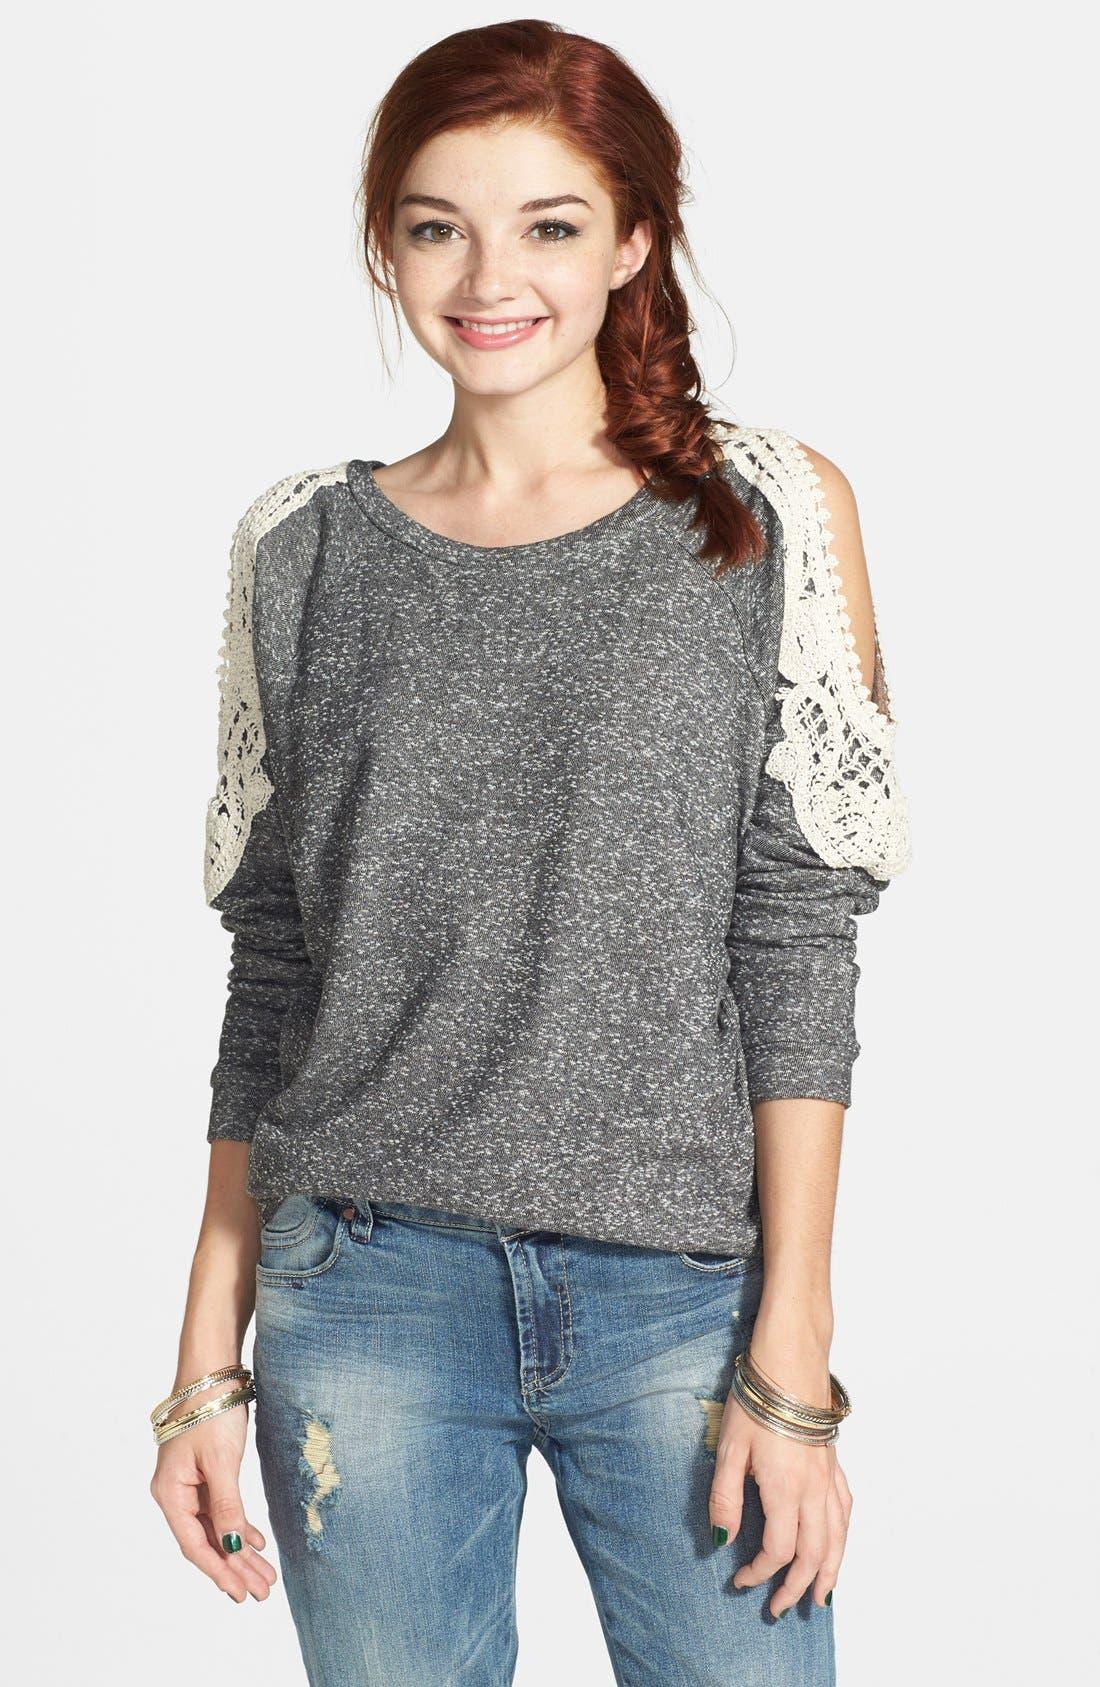 Alternate Image 1 Selected - Haute Society Crochet Detail Cold Shoulder Sweatshirt (Juniors) (Online Only)